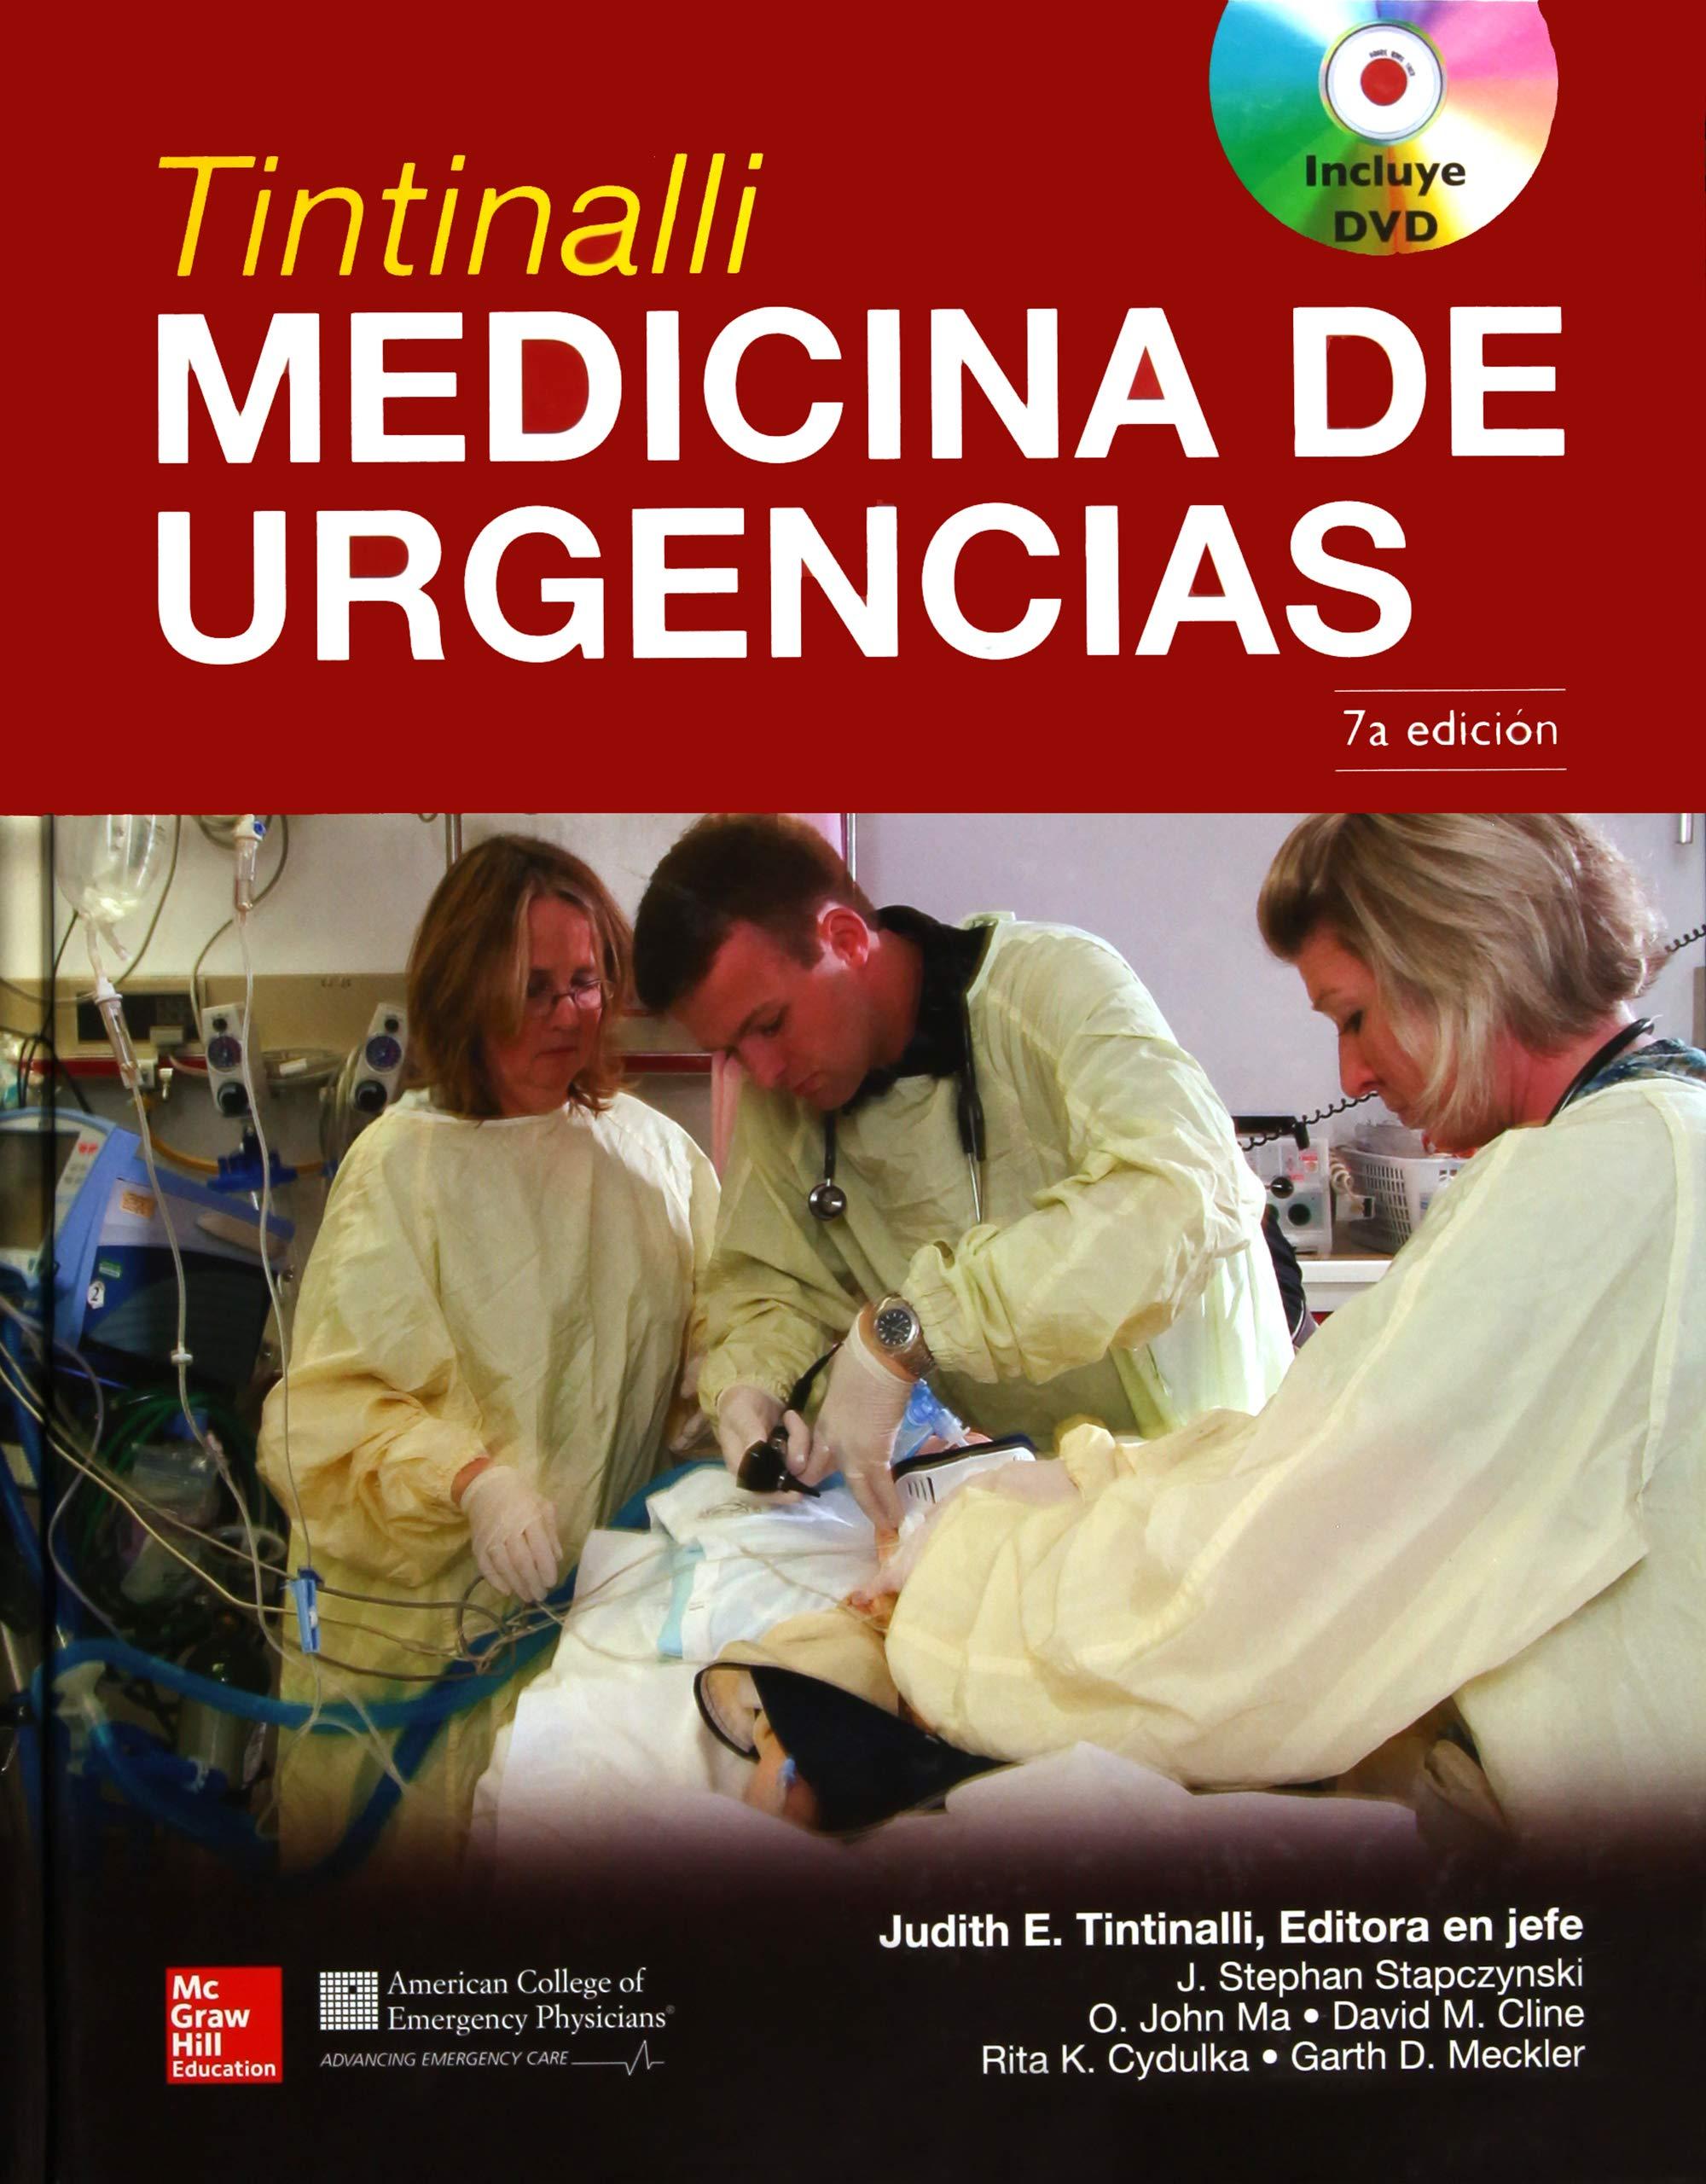 Tintinalli Medicina De Urgencias Pdf